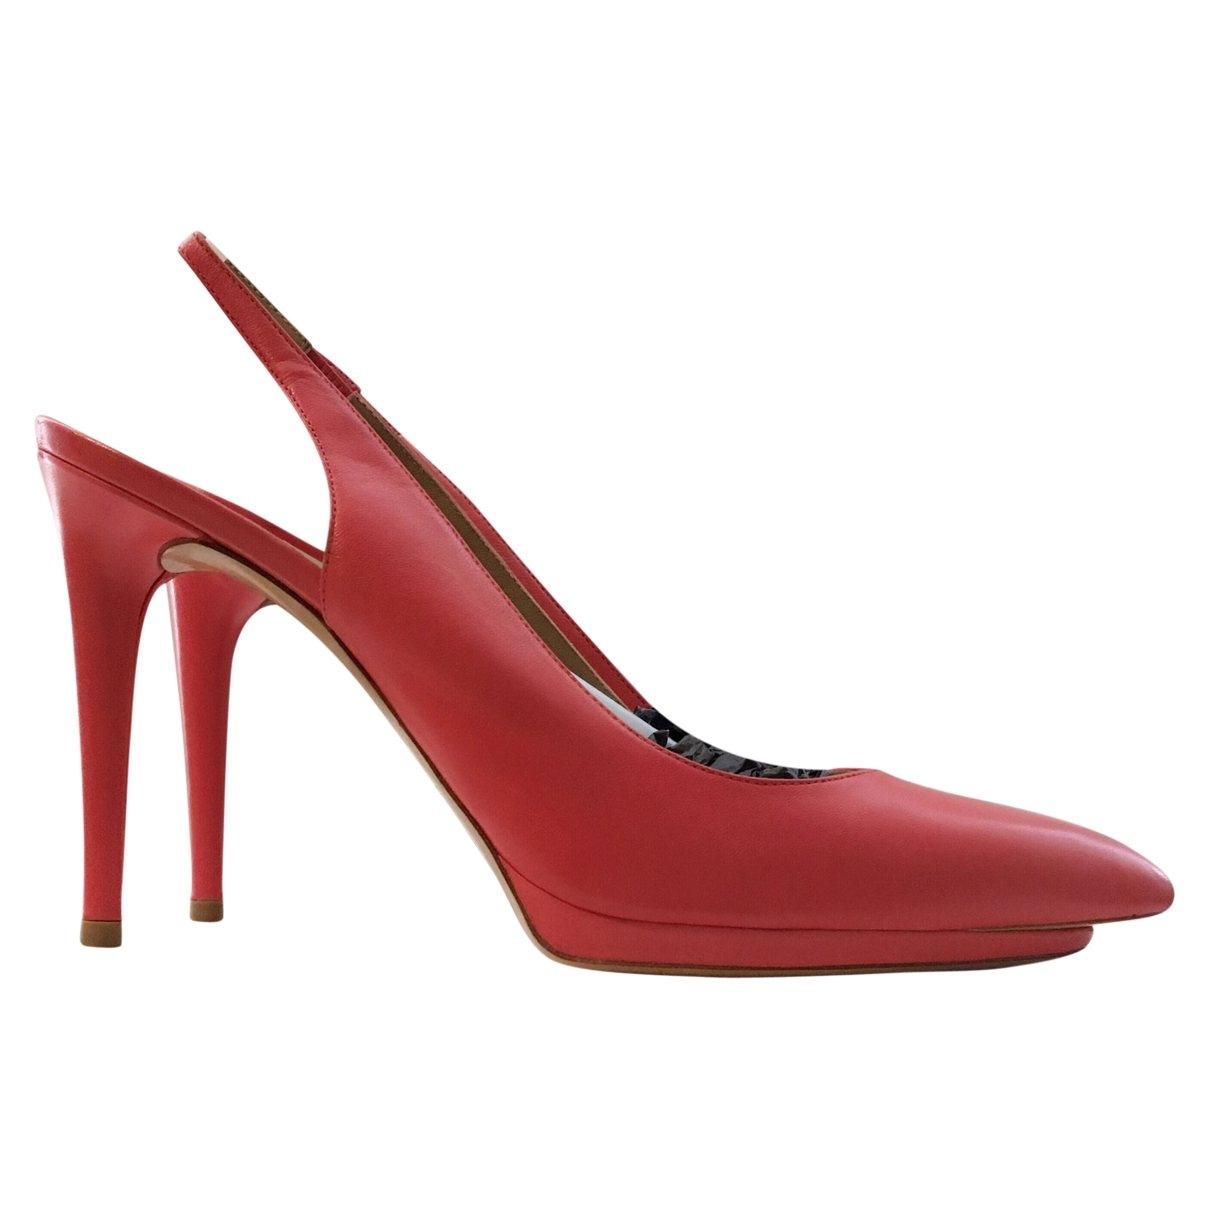 Balenciaga \N Red Leather Heels for Women 39 EU